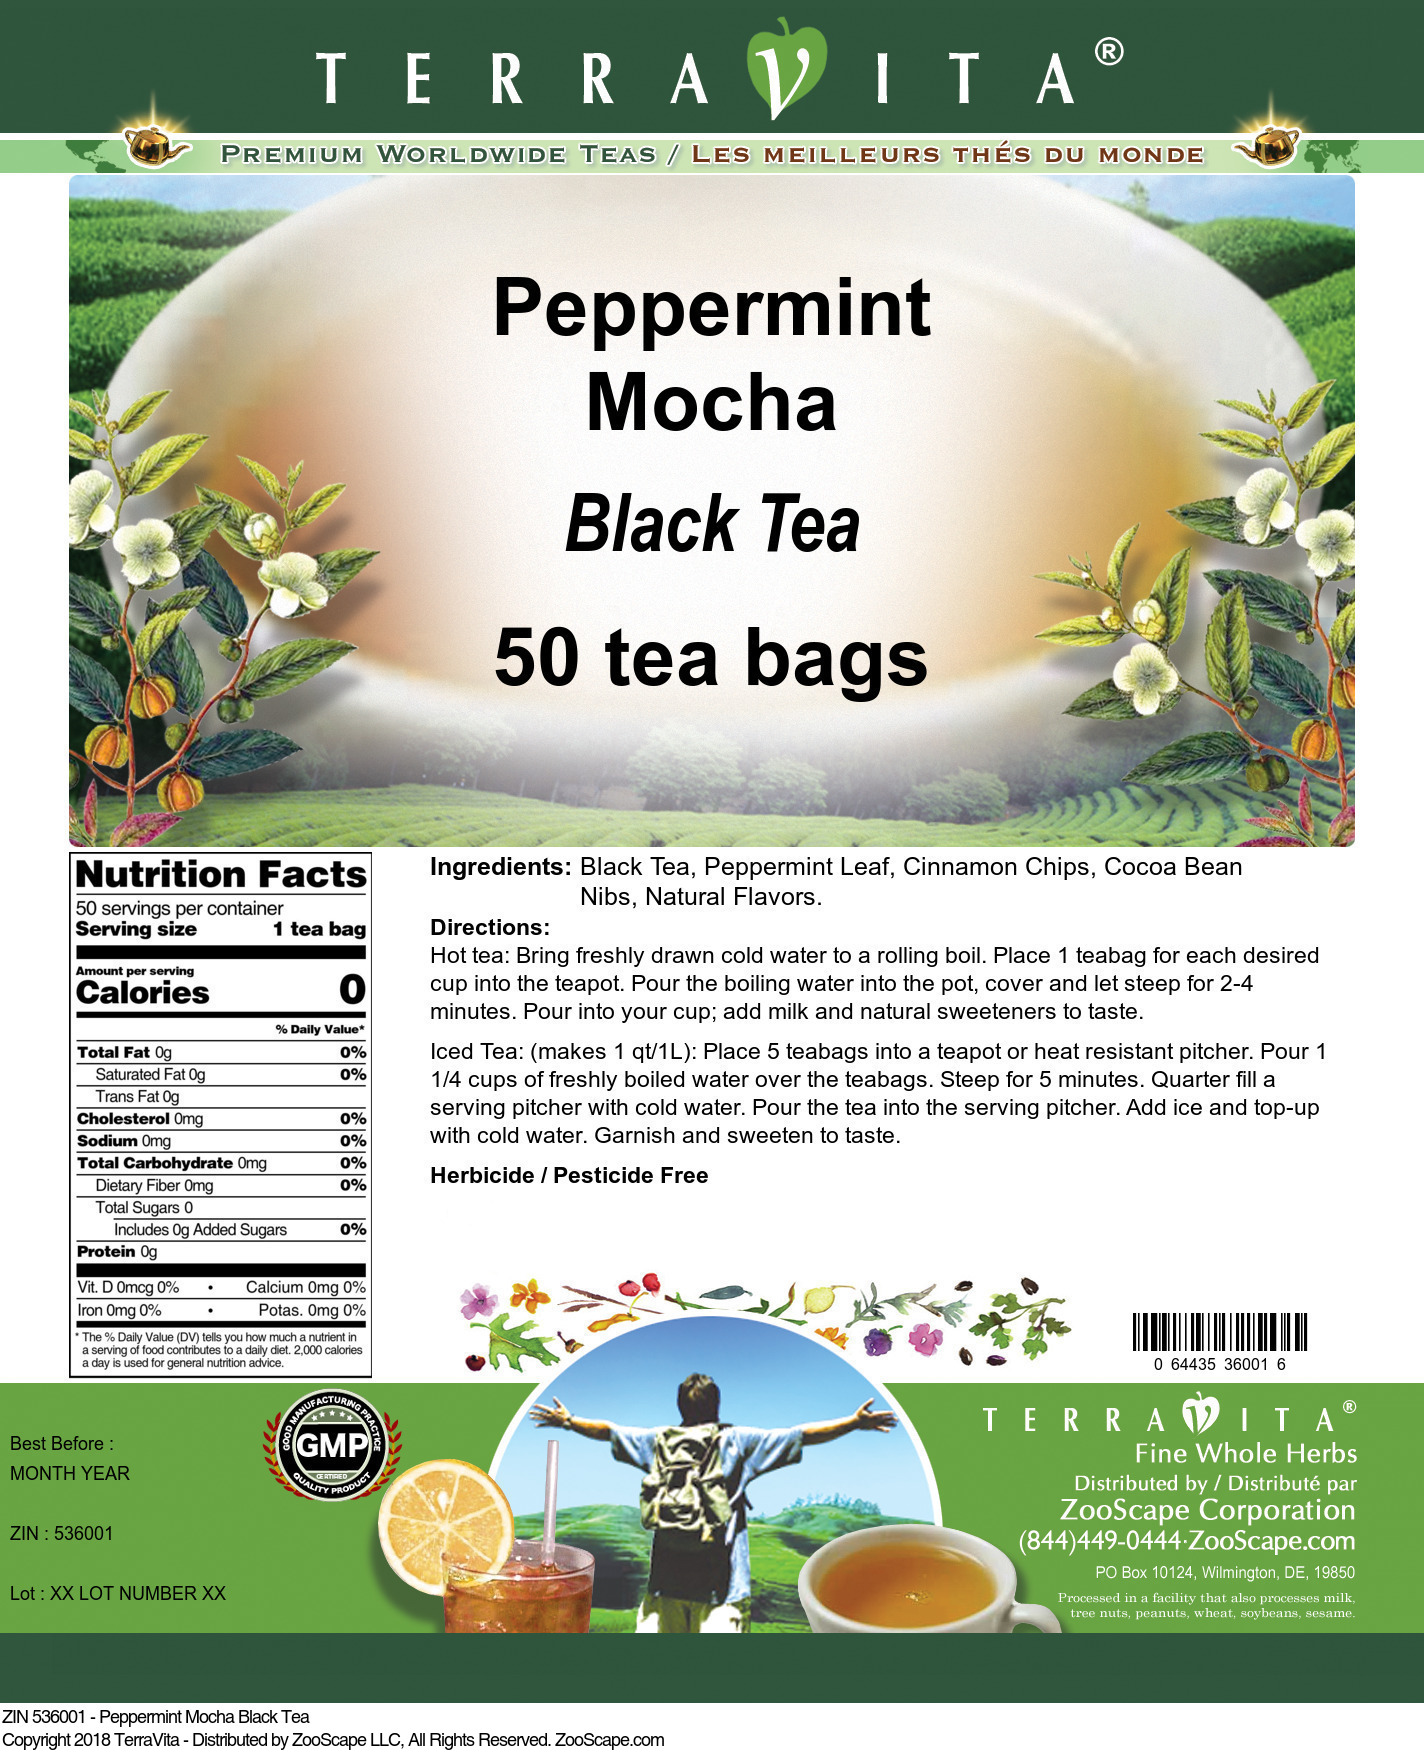 Peppermint Mocha Black Tea